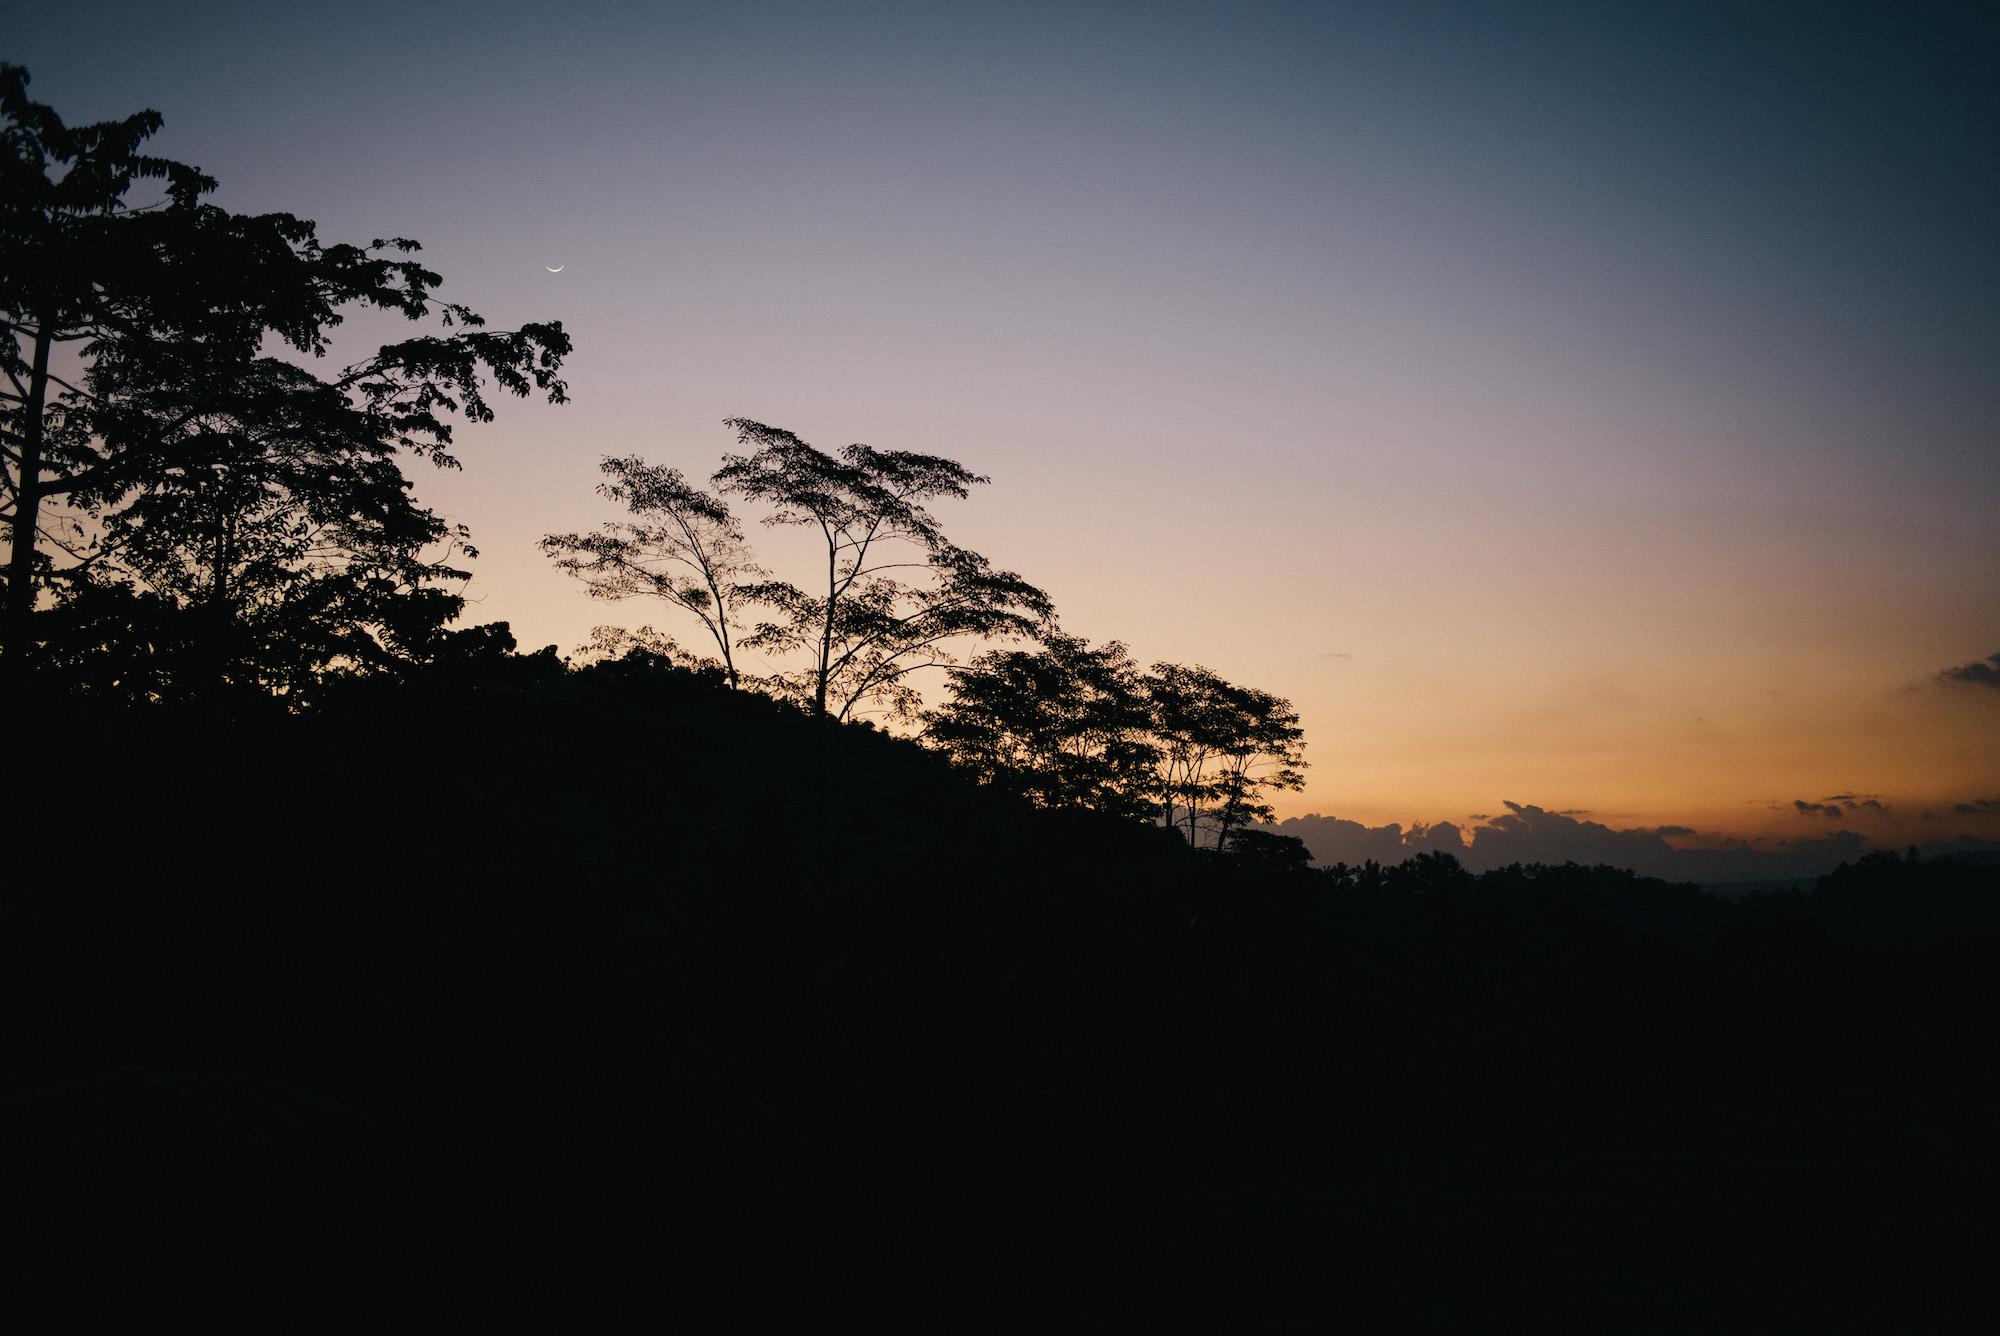 Dusk in Sidemen, Bali near Mount Agung. Shot on Leica M Typ 240 with Summarit 35mm f/2.5 lens.